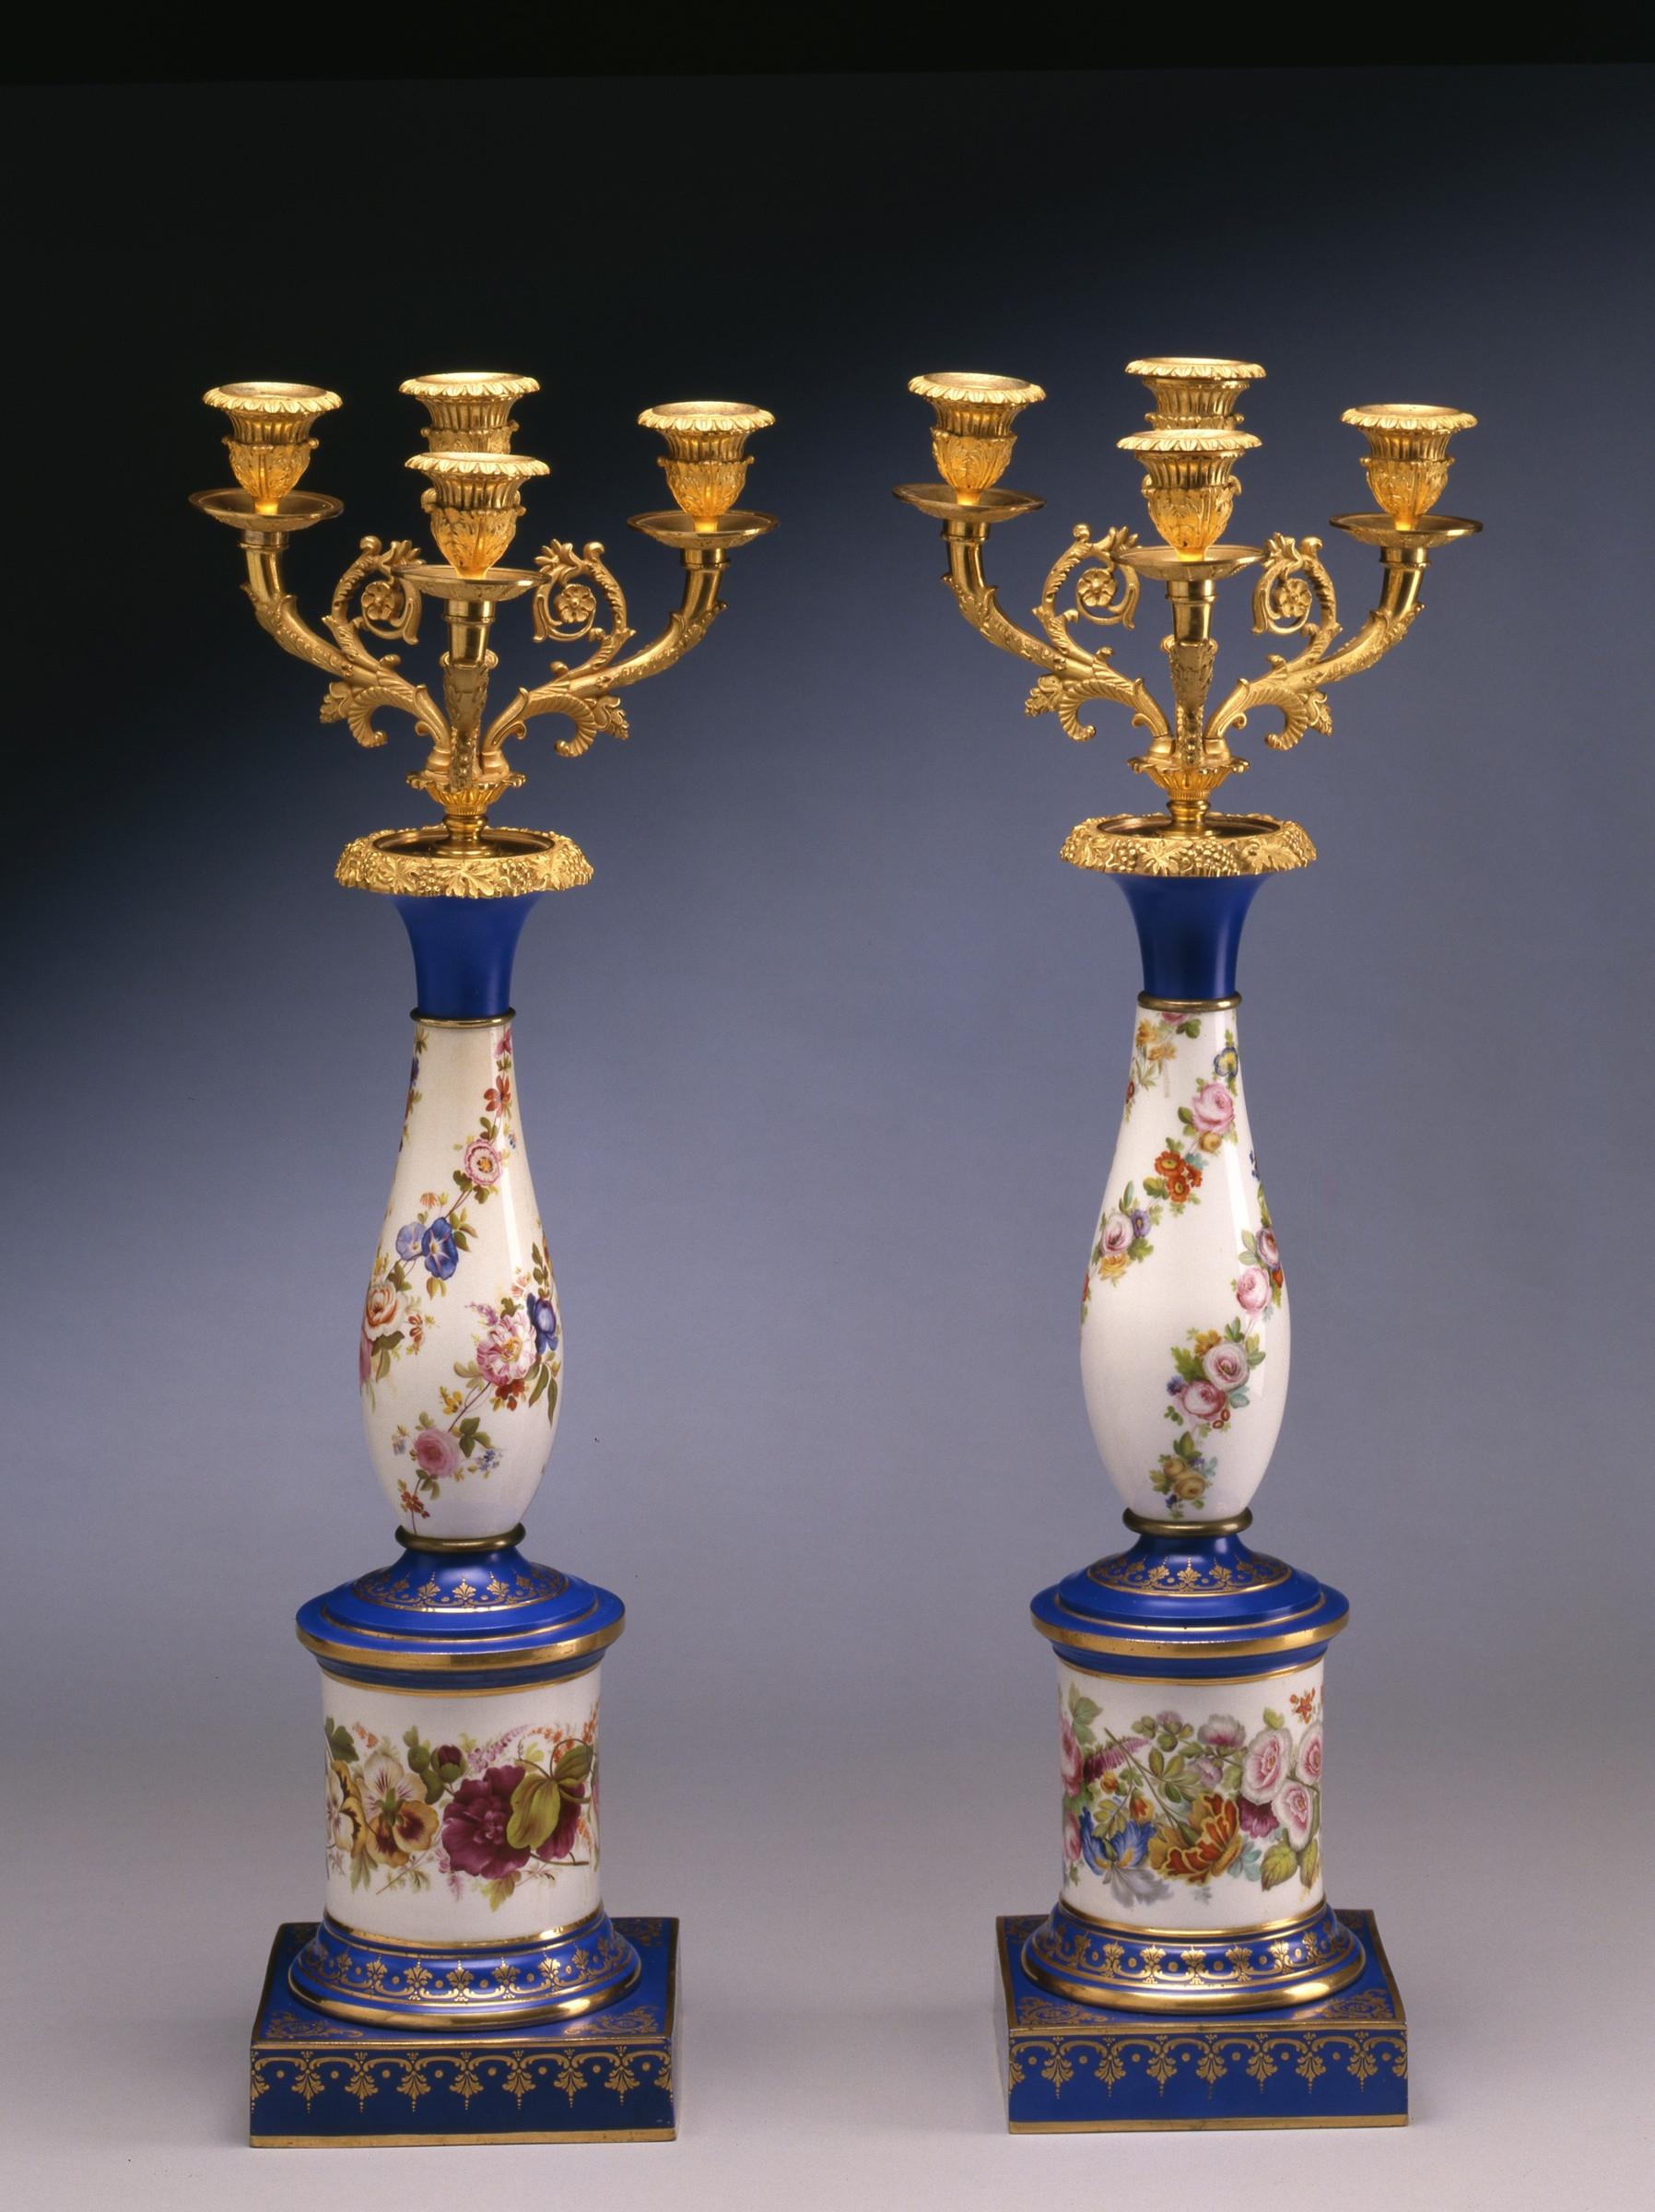 antique porcelain vase markings of paris porcelain a pair of late empire three light candelabra paris within a pair of late empire three light candelabra